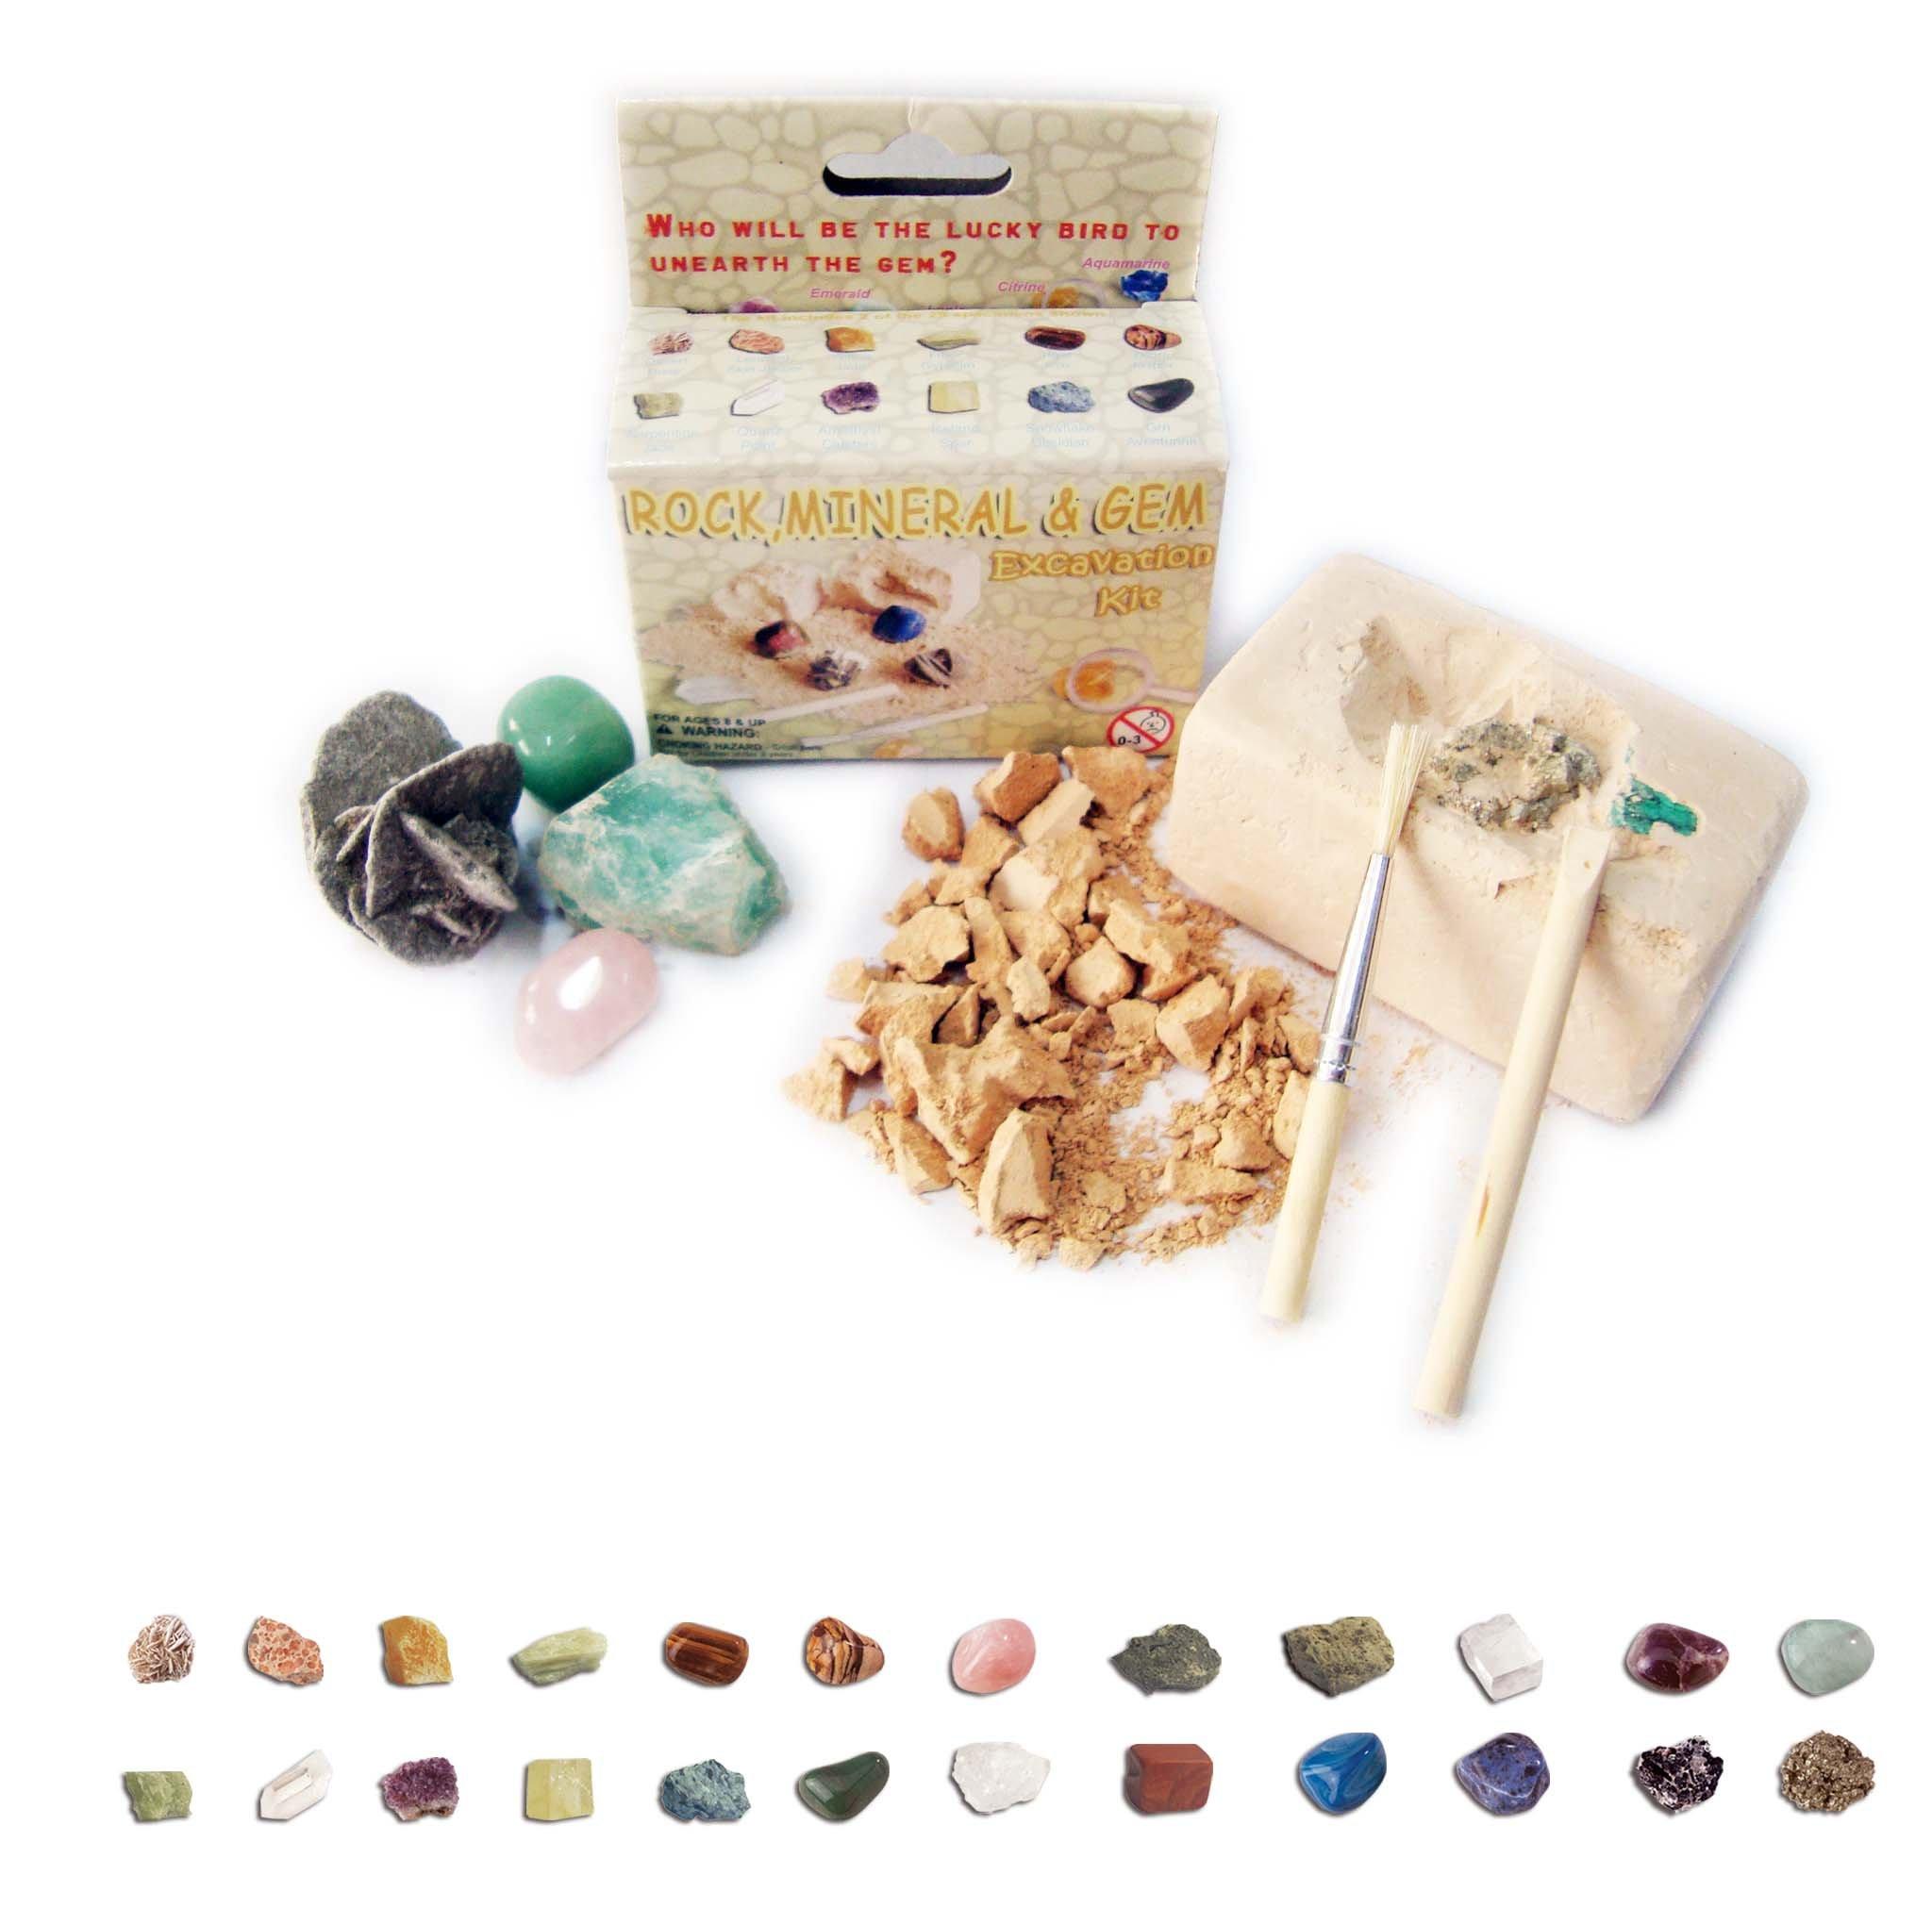 4 Pack - Small Rock, Mineral & Gem Excavation Kit